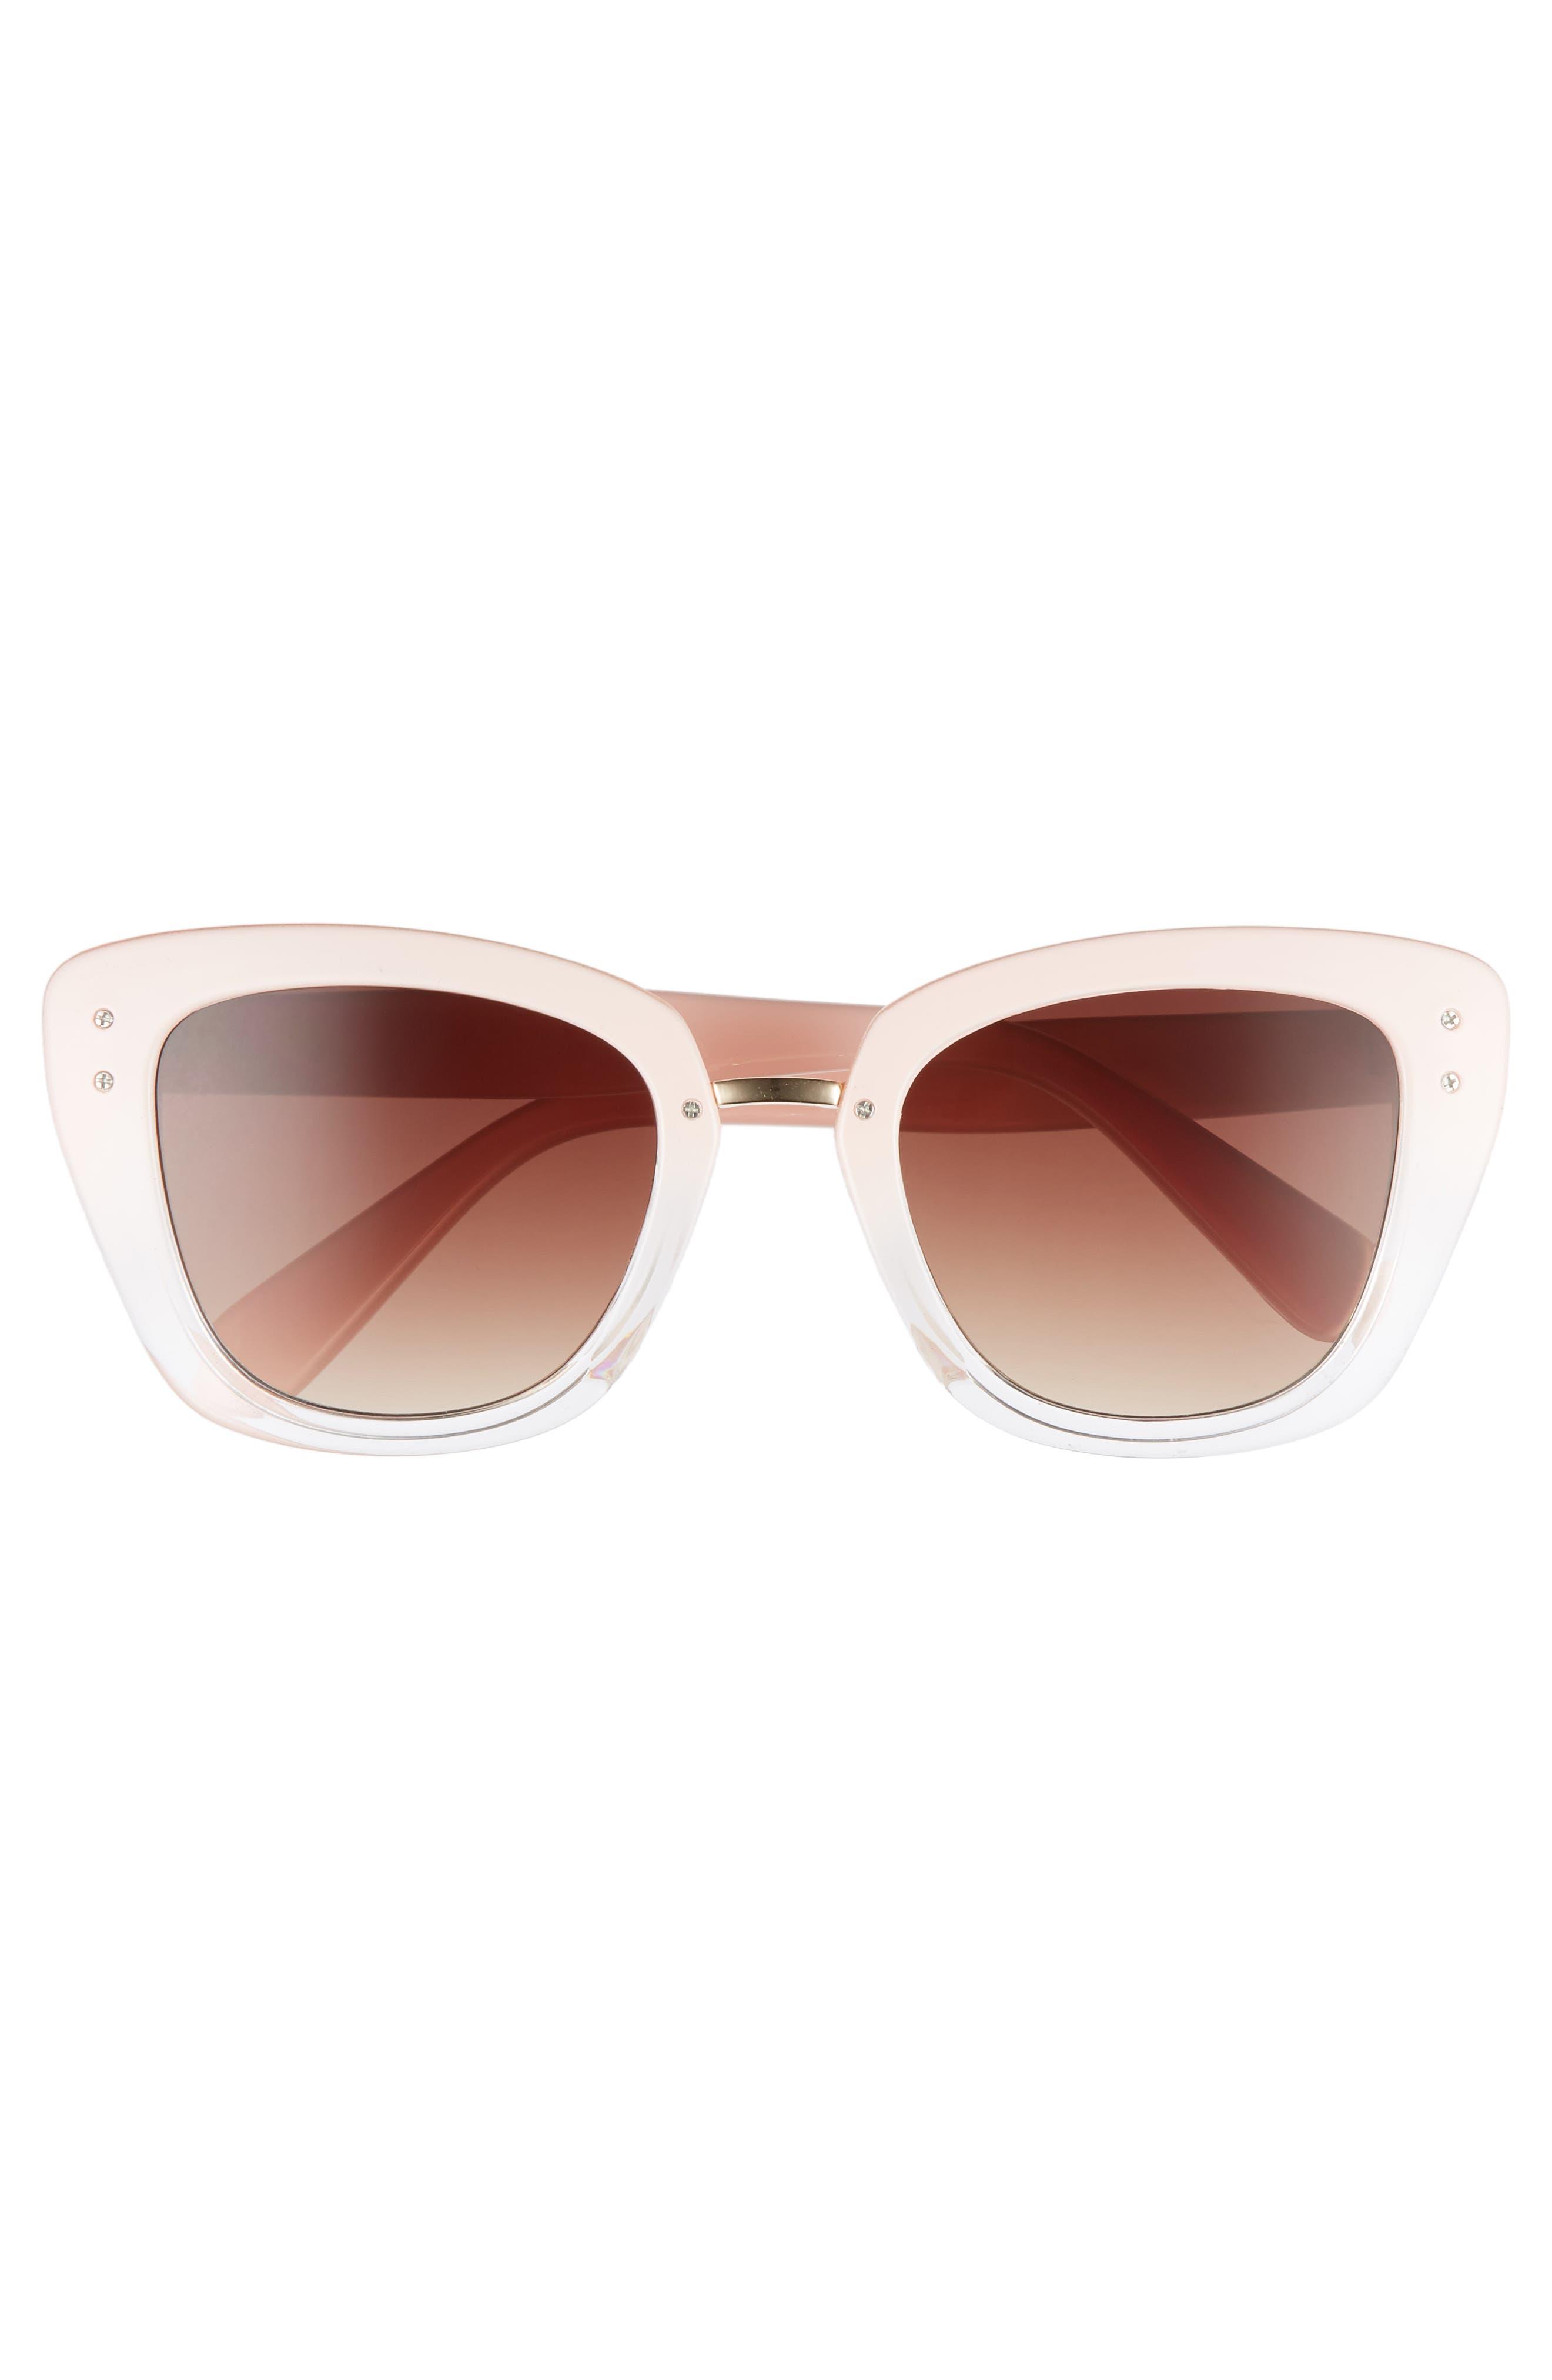 51mm Ombré Square Sunglasses,                             Alternate thumbnail 3, color,                             Pink/ Clear